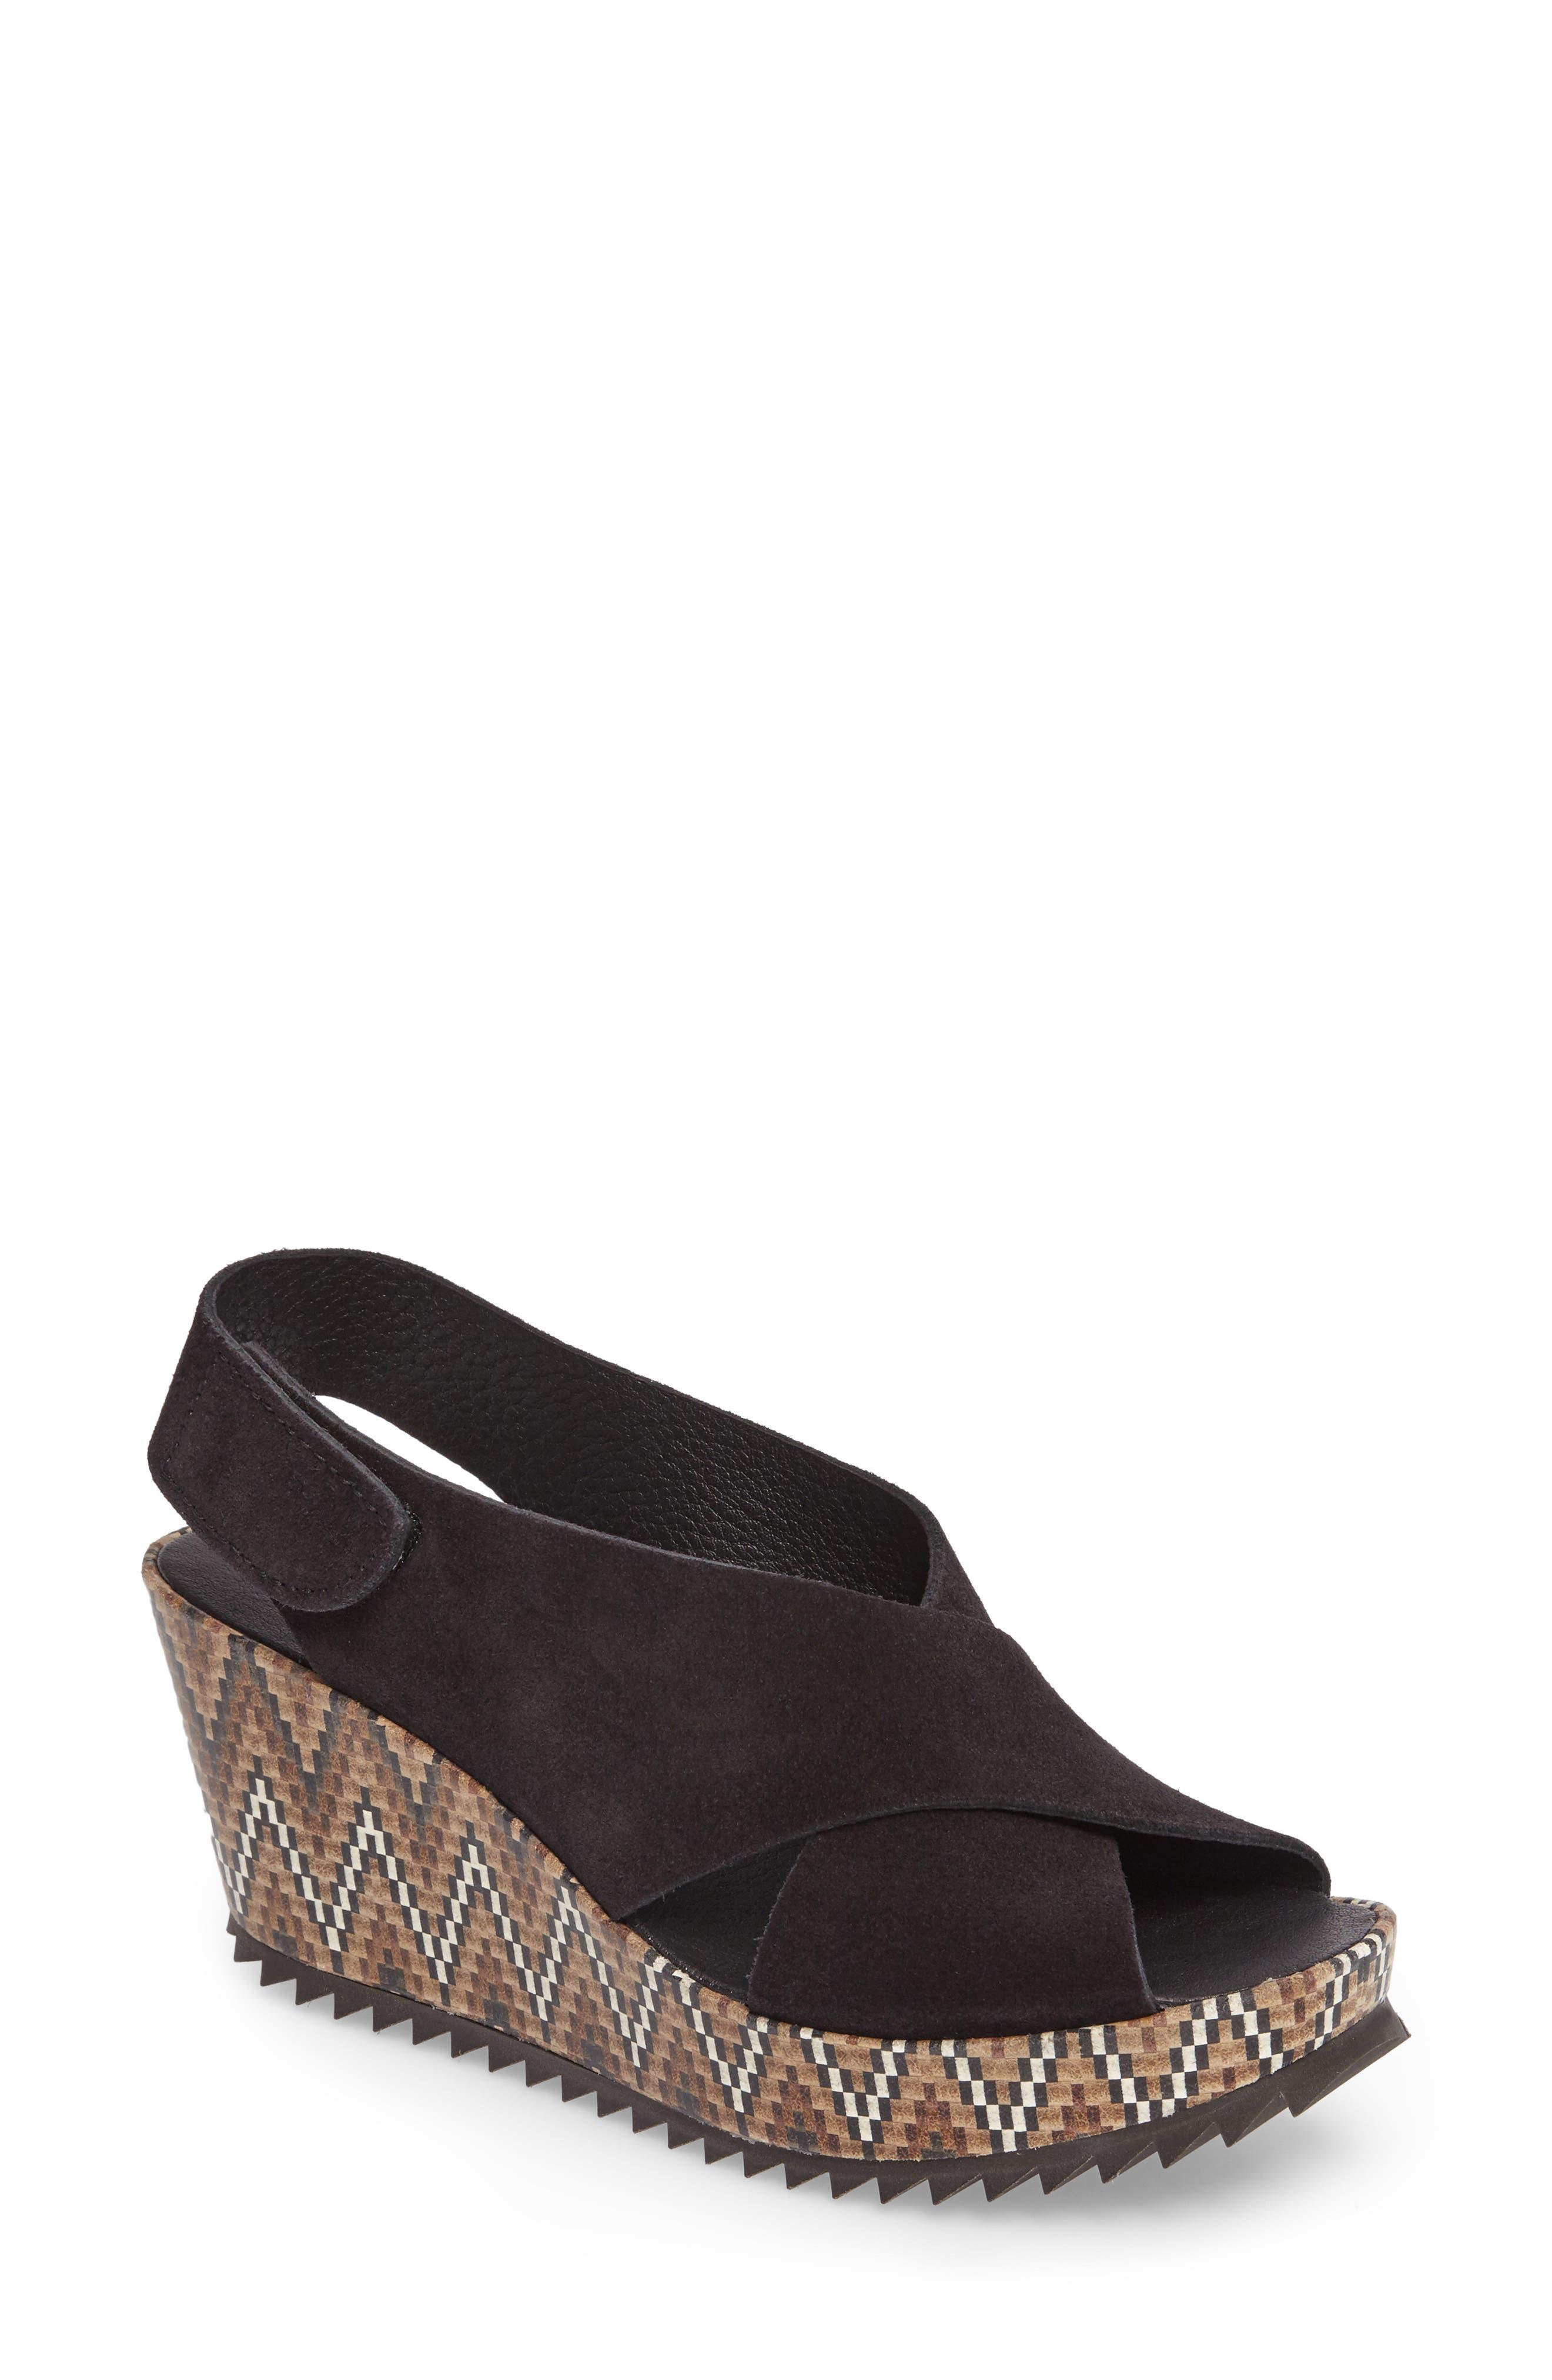 'Federica' Wedge Sandal,                             Main thumbnail 1, color,                             Black Castoro